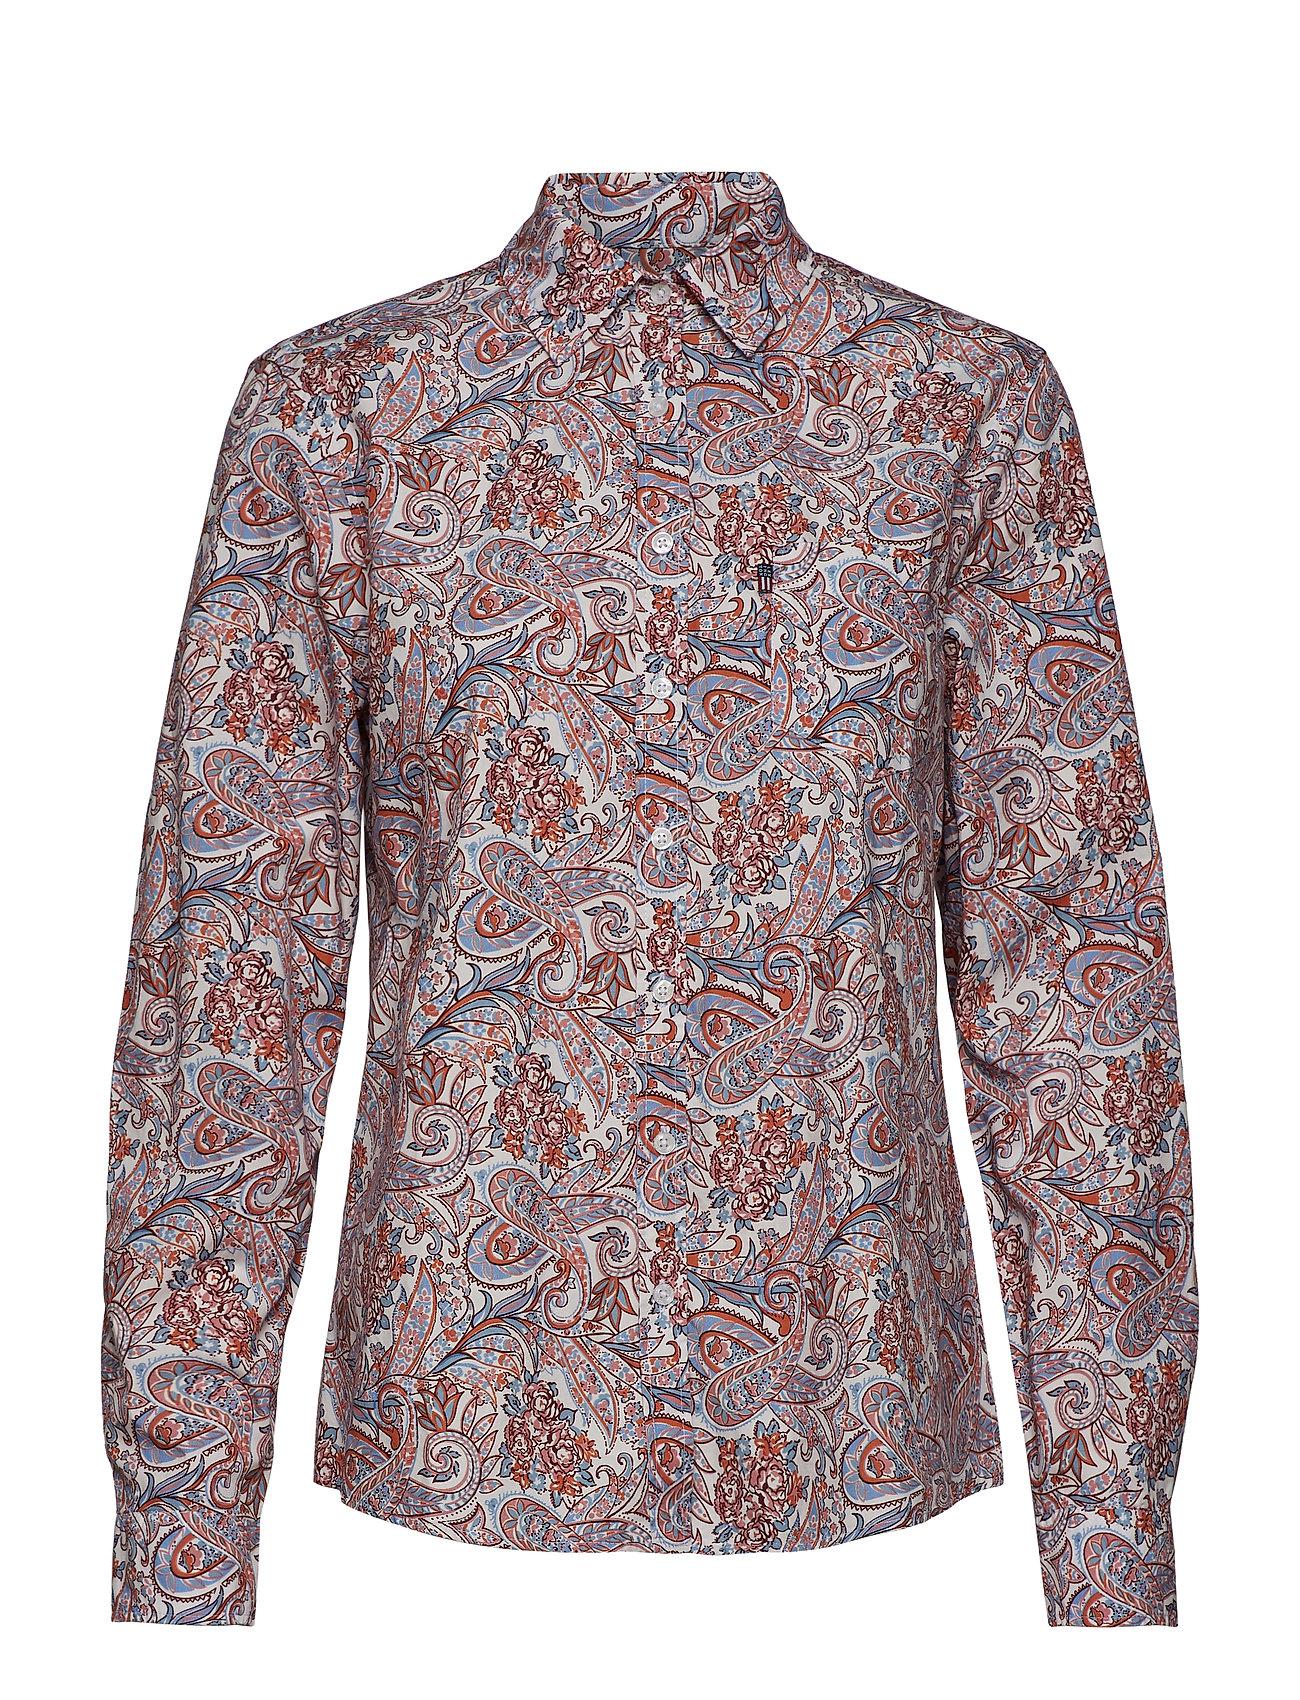 Lexington Clothing Emily Poplin Shirt